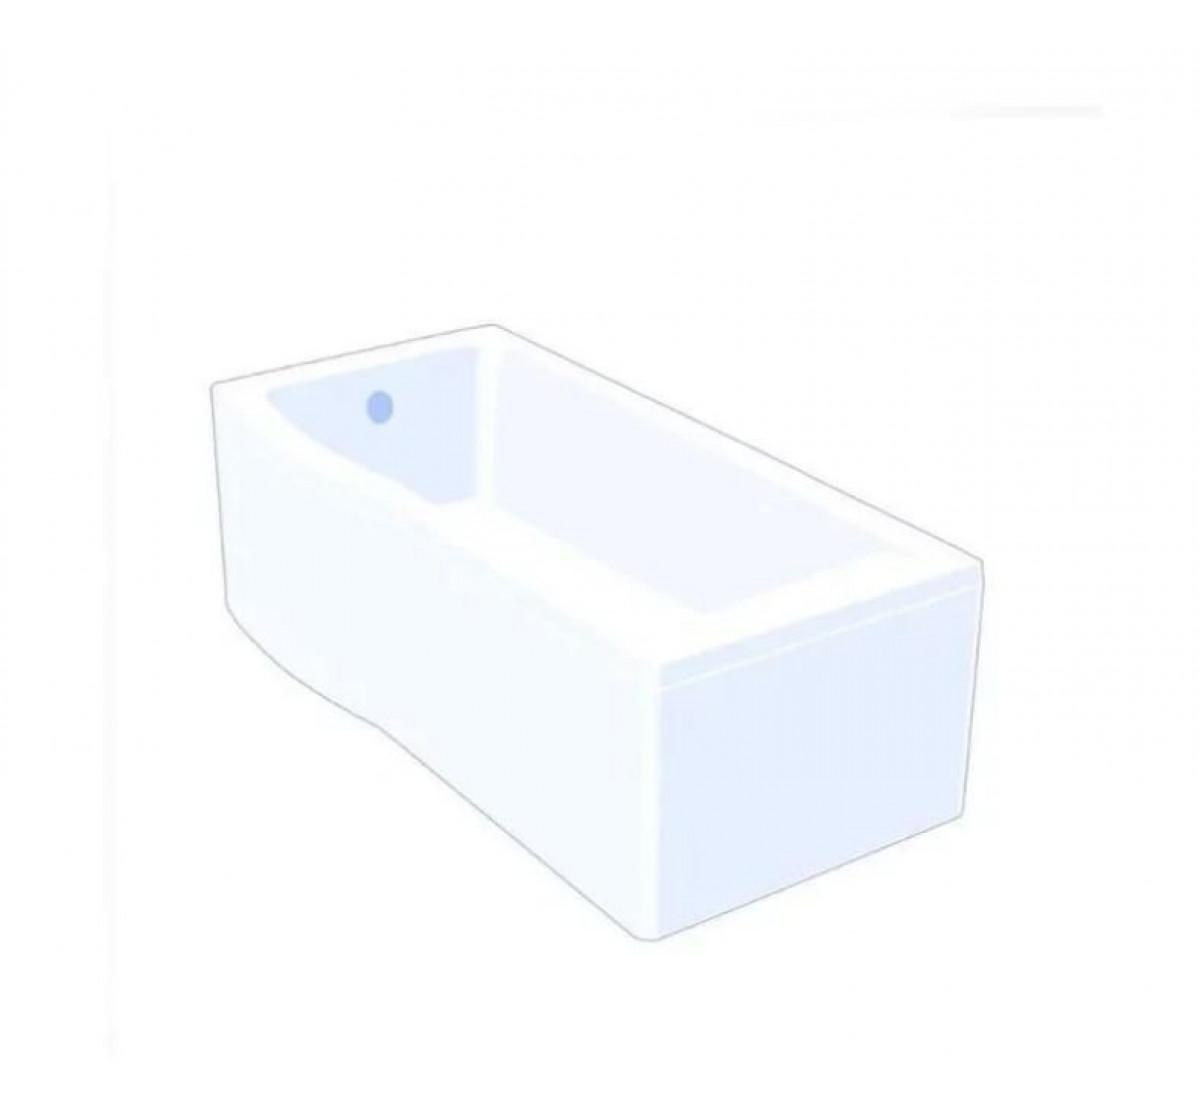 Carron Aspect 1700 X 700 Left Hand Shower Bath Q4 02025